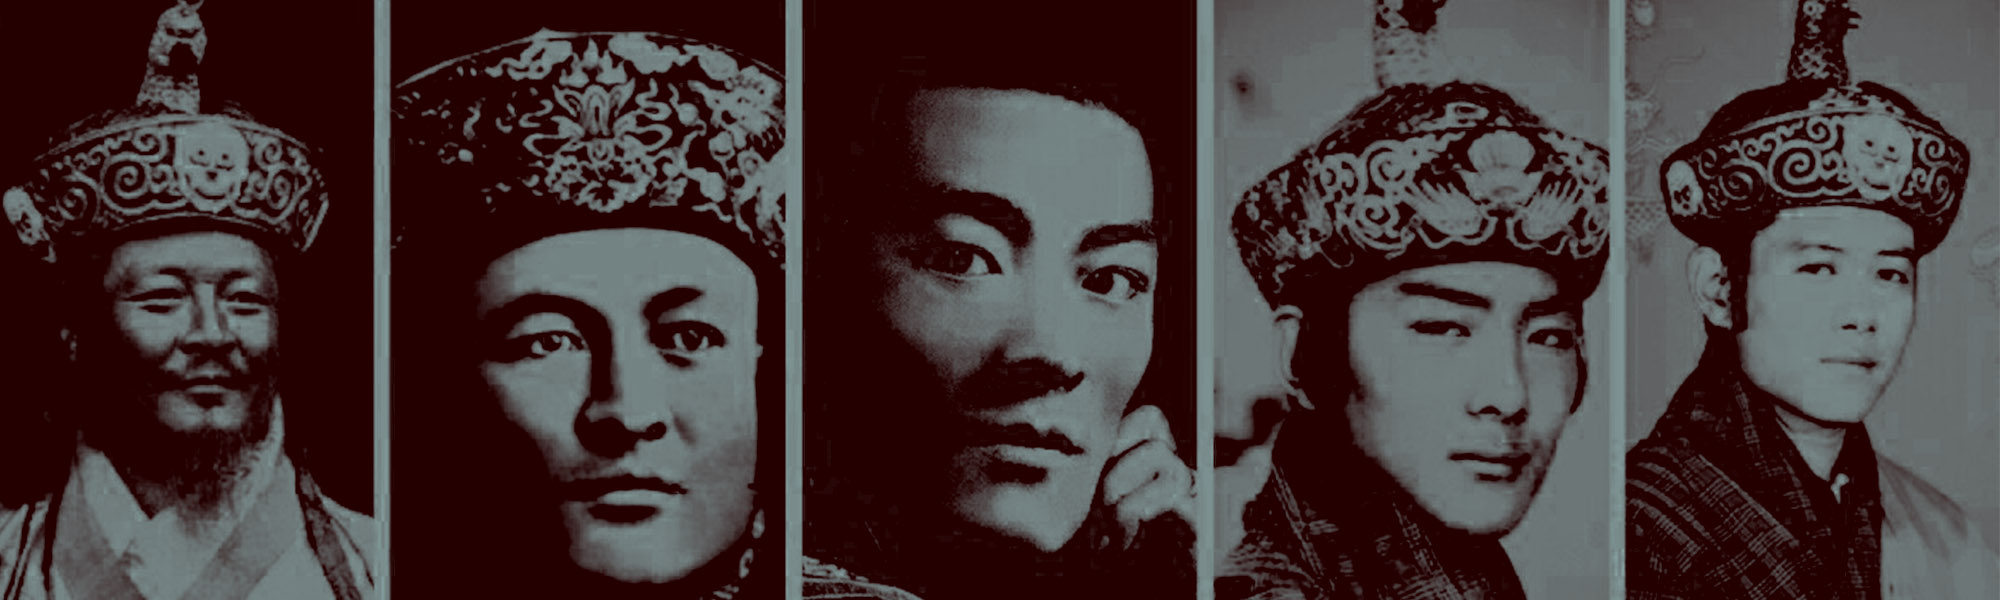 Kings of Bhutan